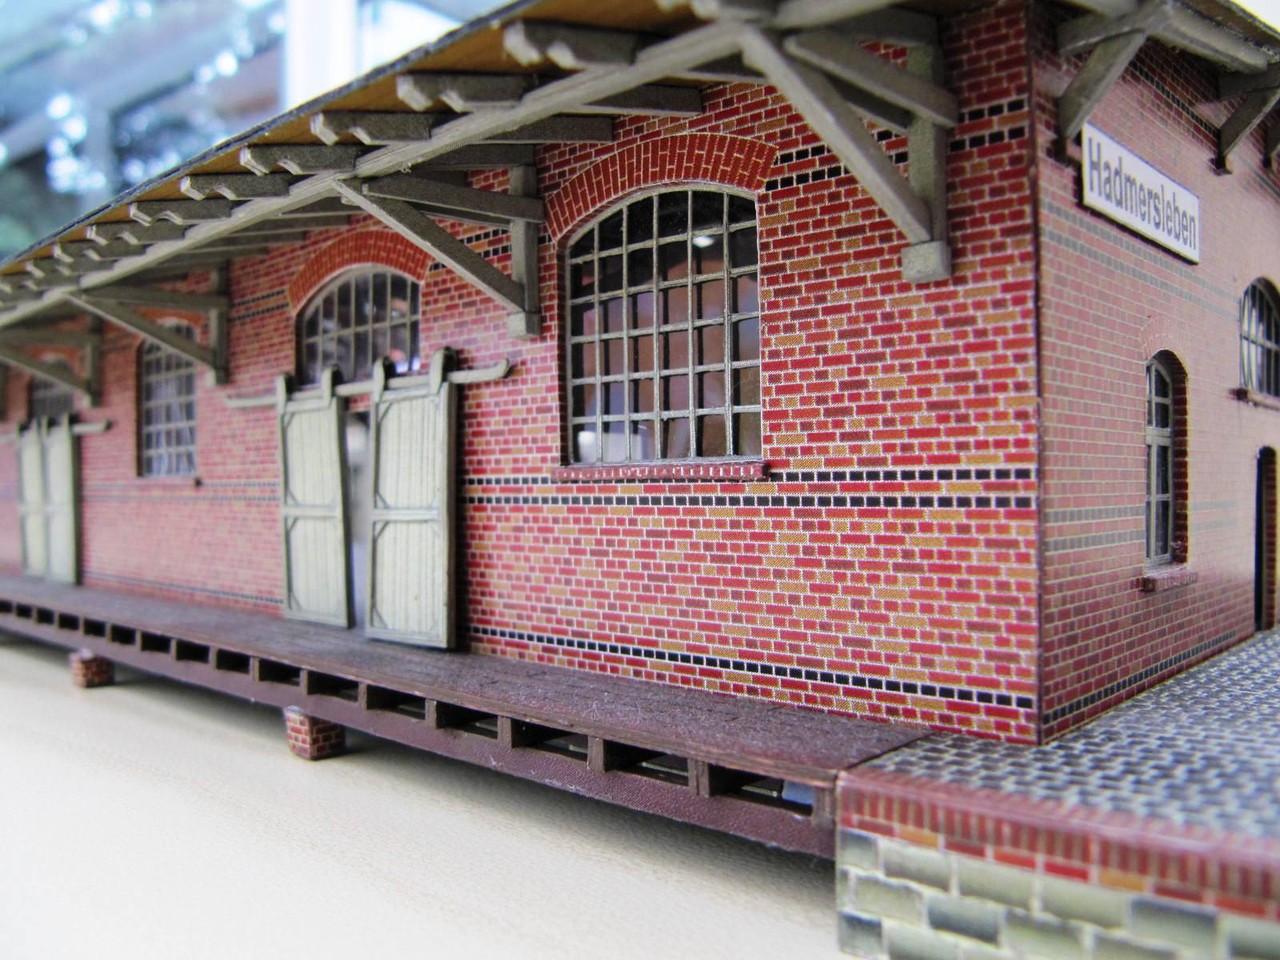 (c) W. Fehse - Blick auf Dachkonstruktion 1:87 (H0)